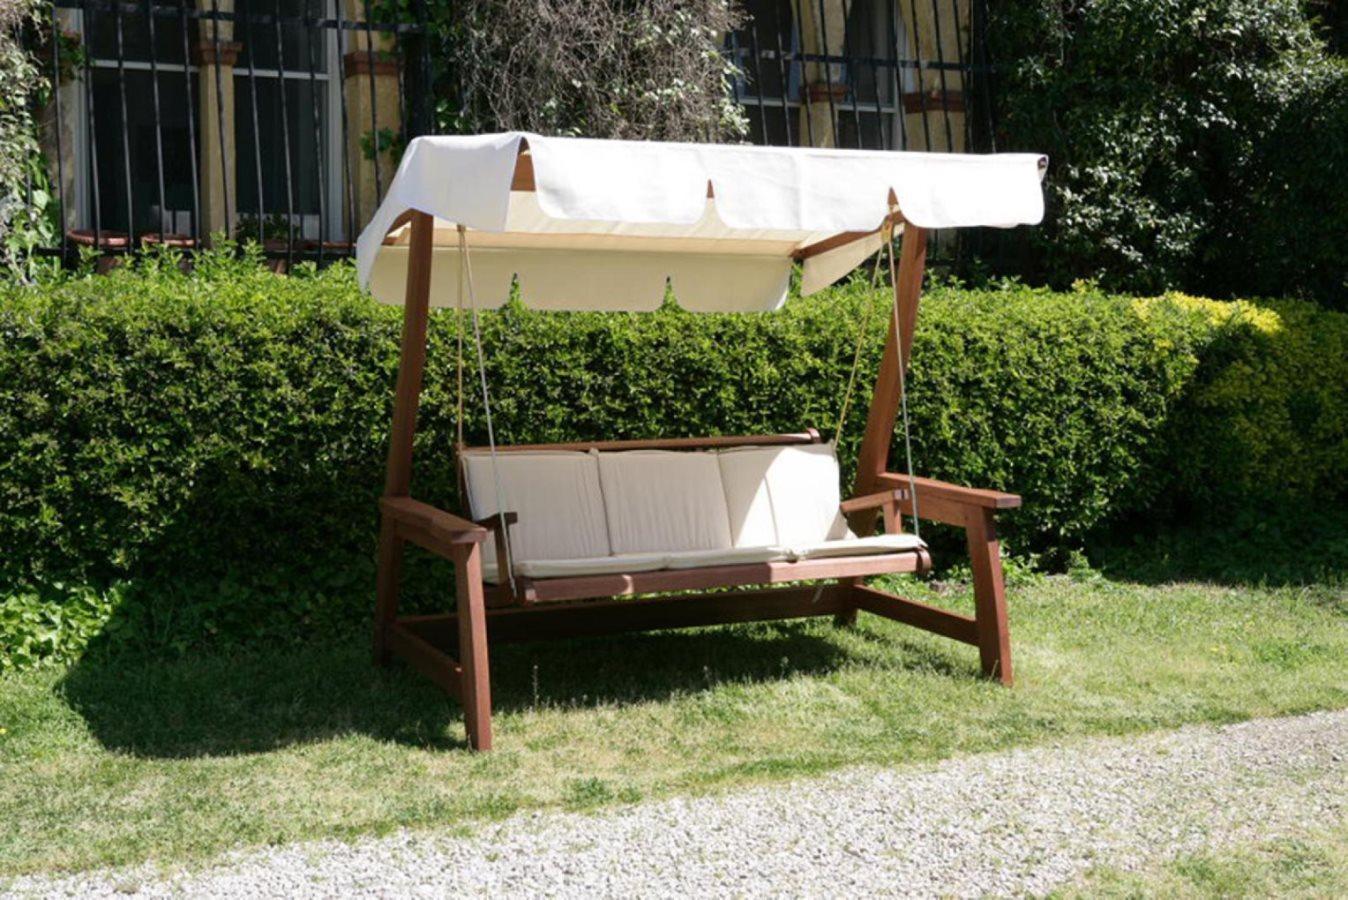 Dondolo da giardino 3 posti in legno meranti deluxe for Offerte giardino